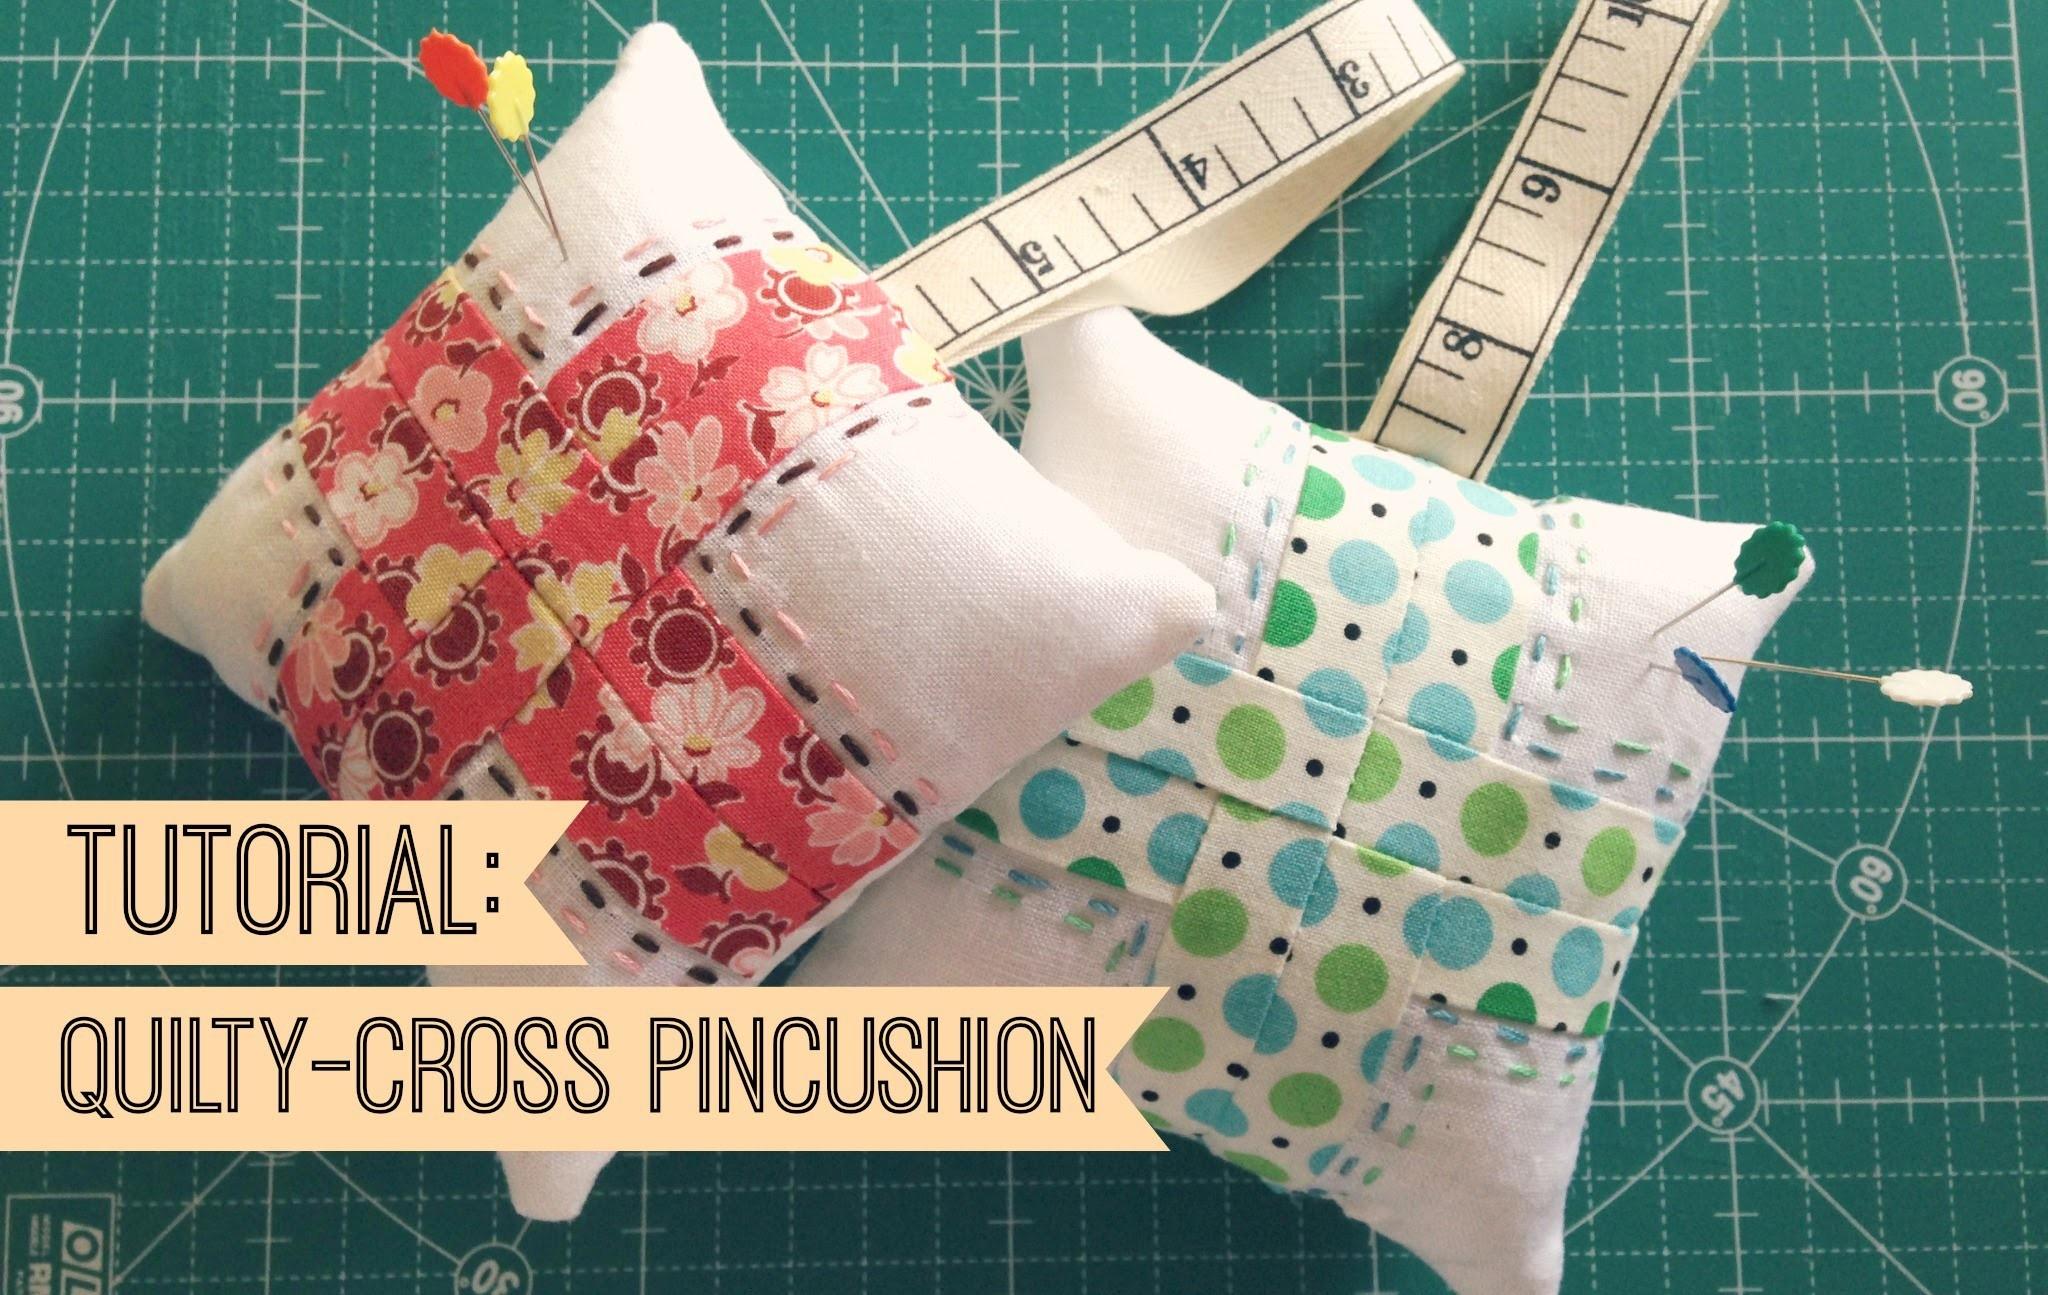 TUTORIAL: Making a Quilty-Cross Pincushion!